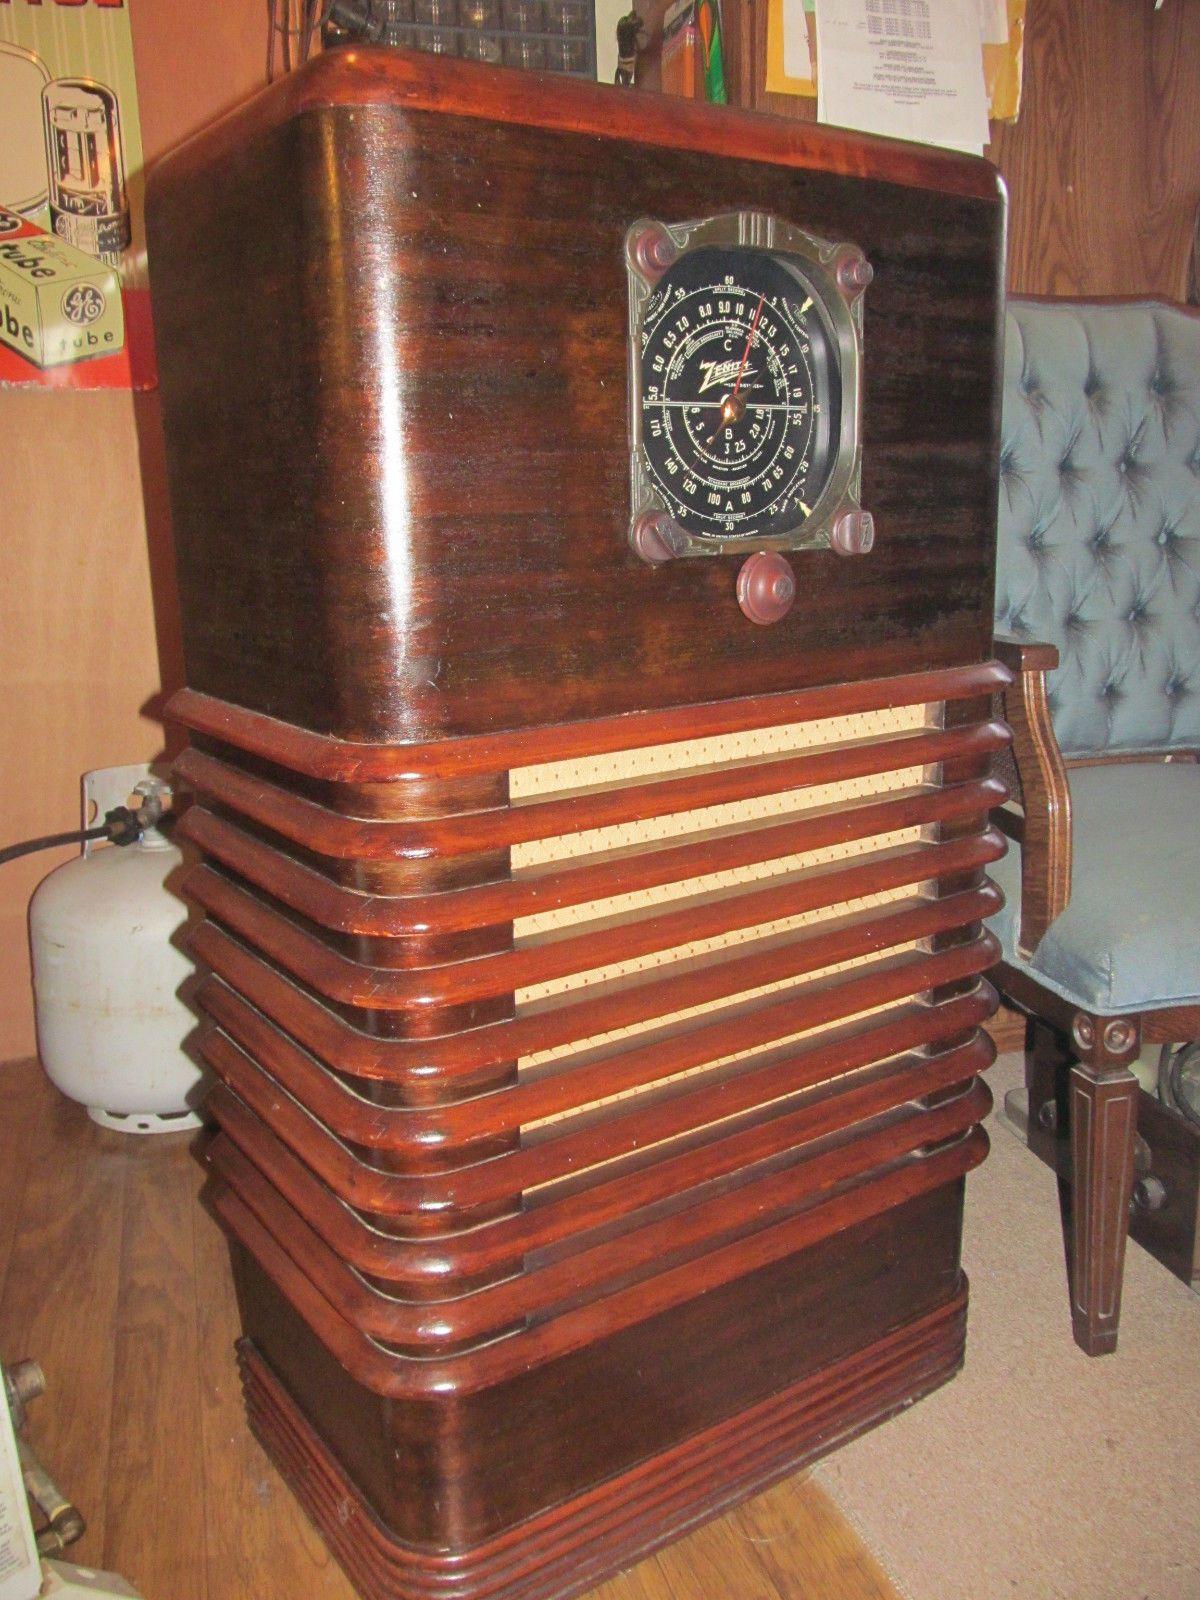 Zenith Zephyr 6s157 1936 6 Tube Console Radio Restored Antique Radio Vintage Radio Retro Radios